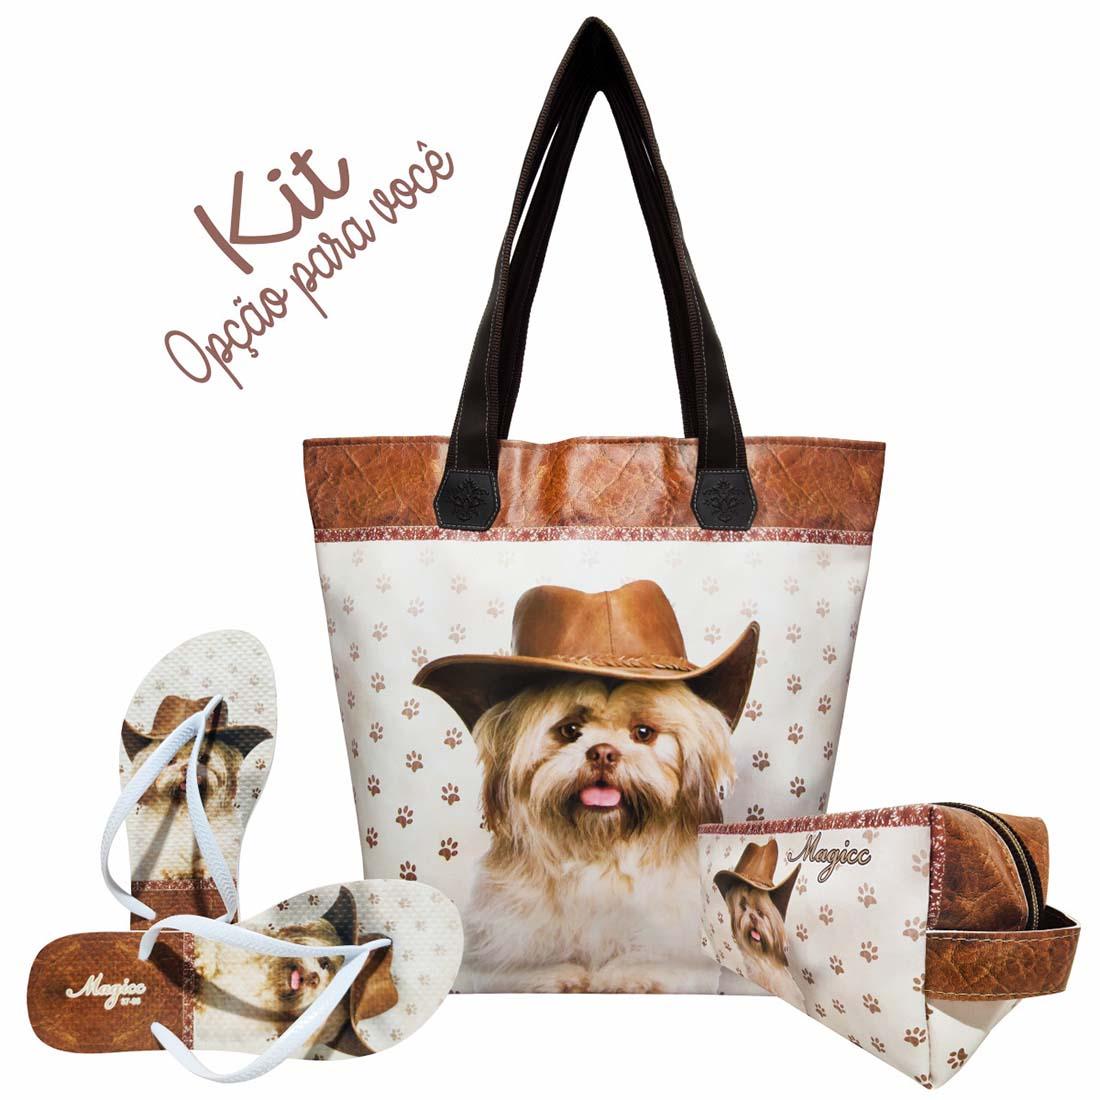 Necessaire Pet Feminina Cachorro com Chapéu, Magicc